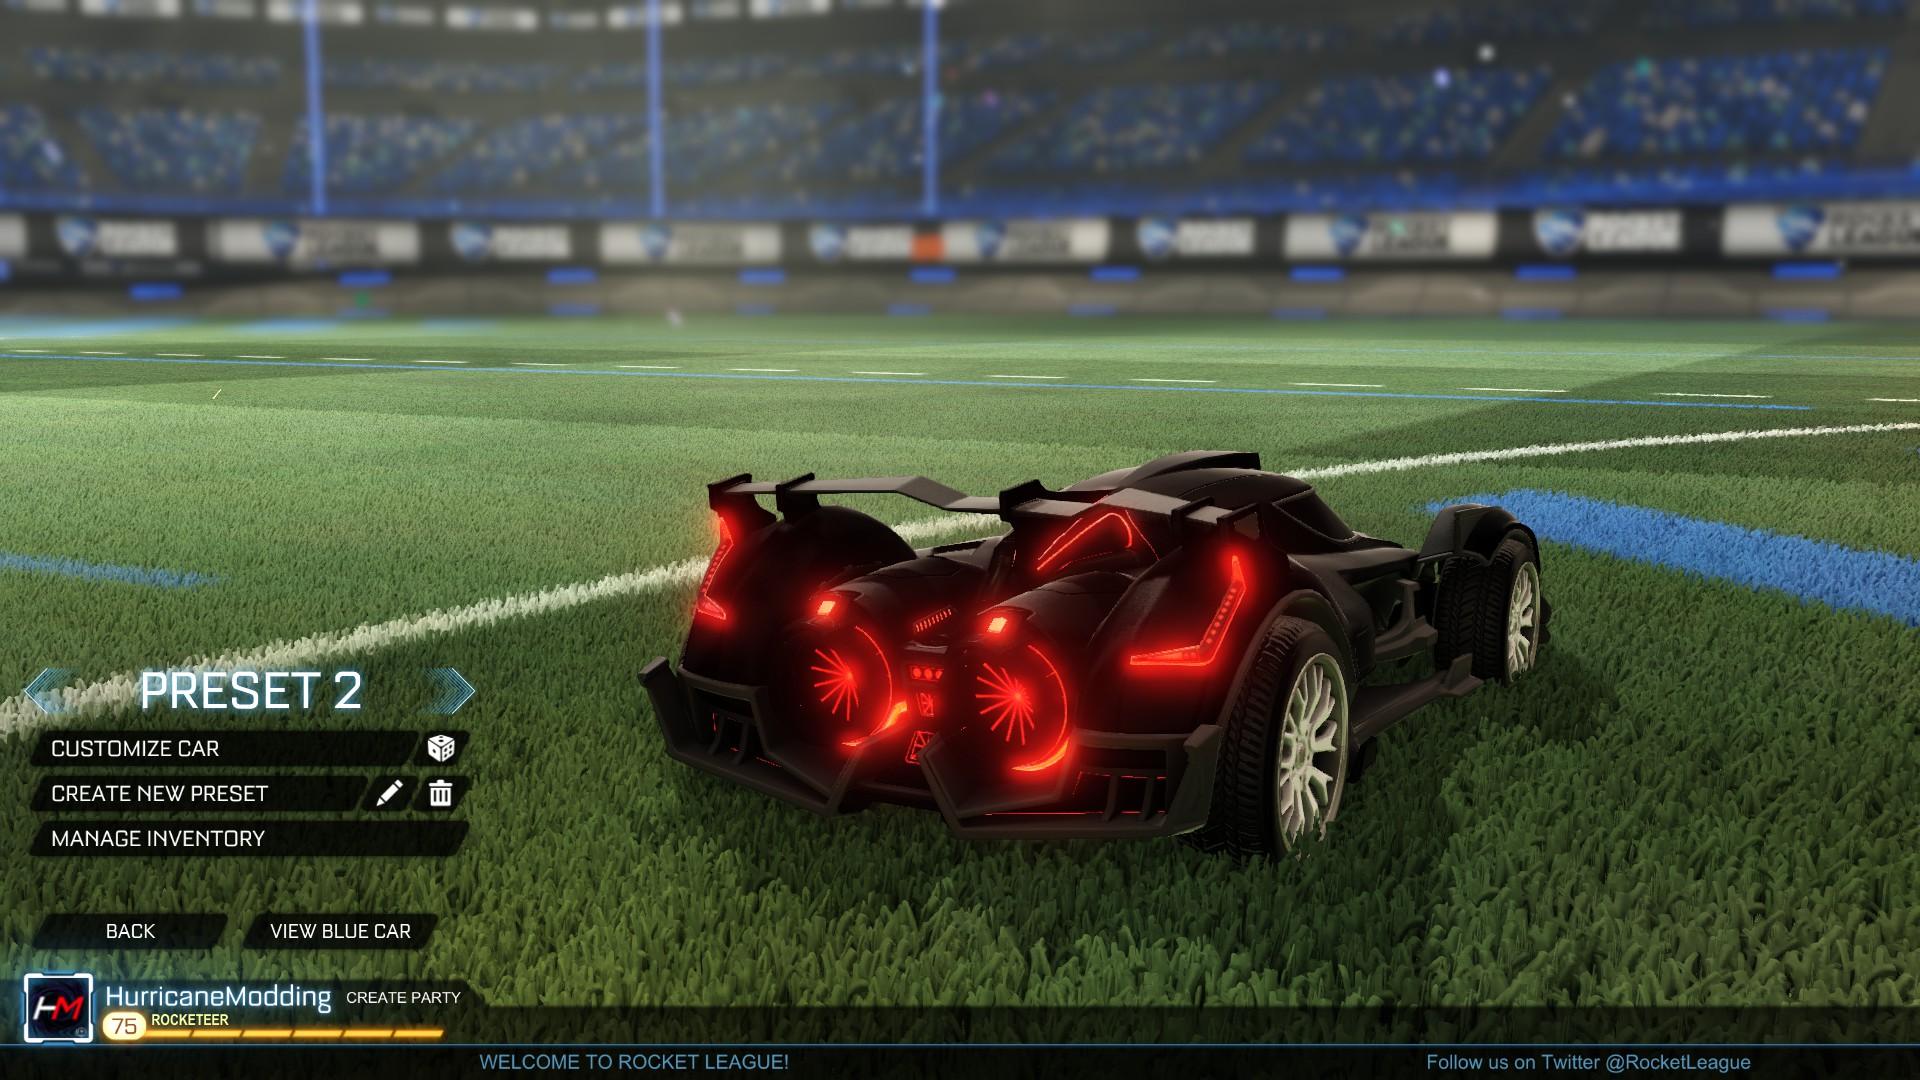 Centio neon mod, GlowEngine 2.0+ var decal